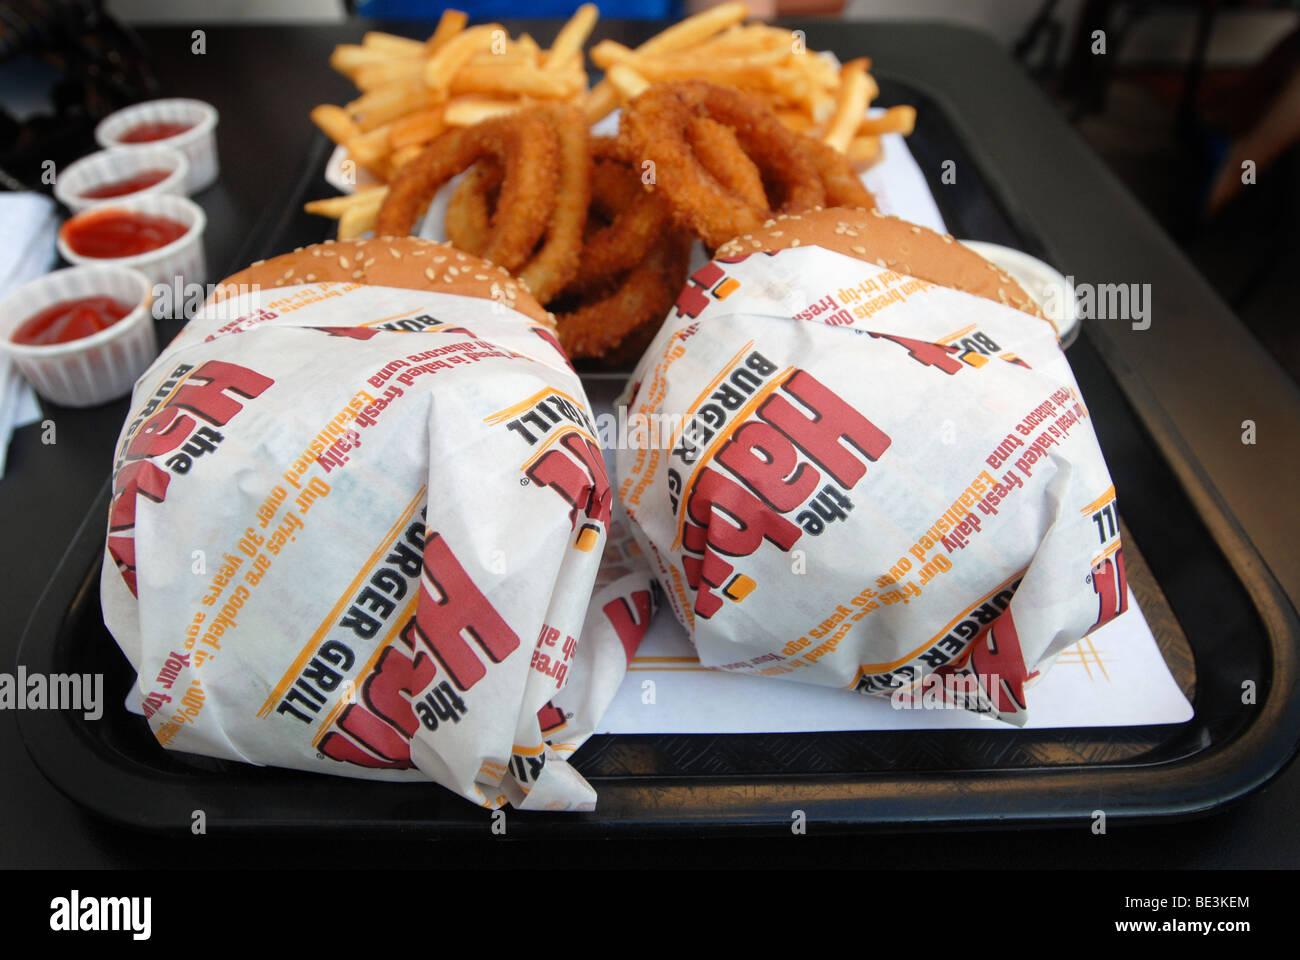 Habit Burger - Stock Image